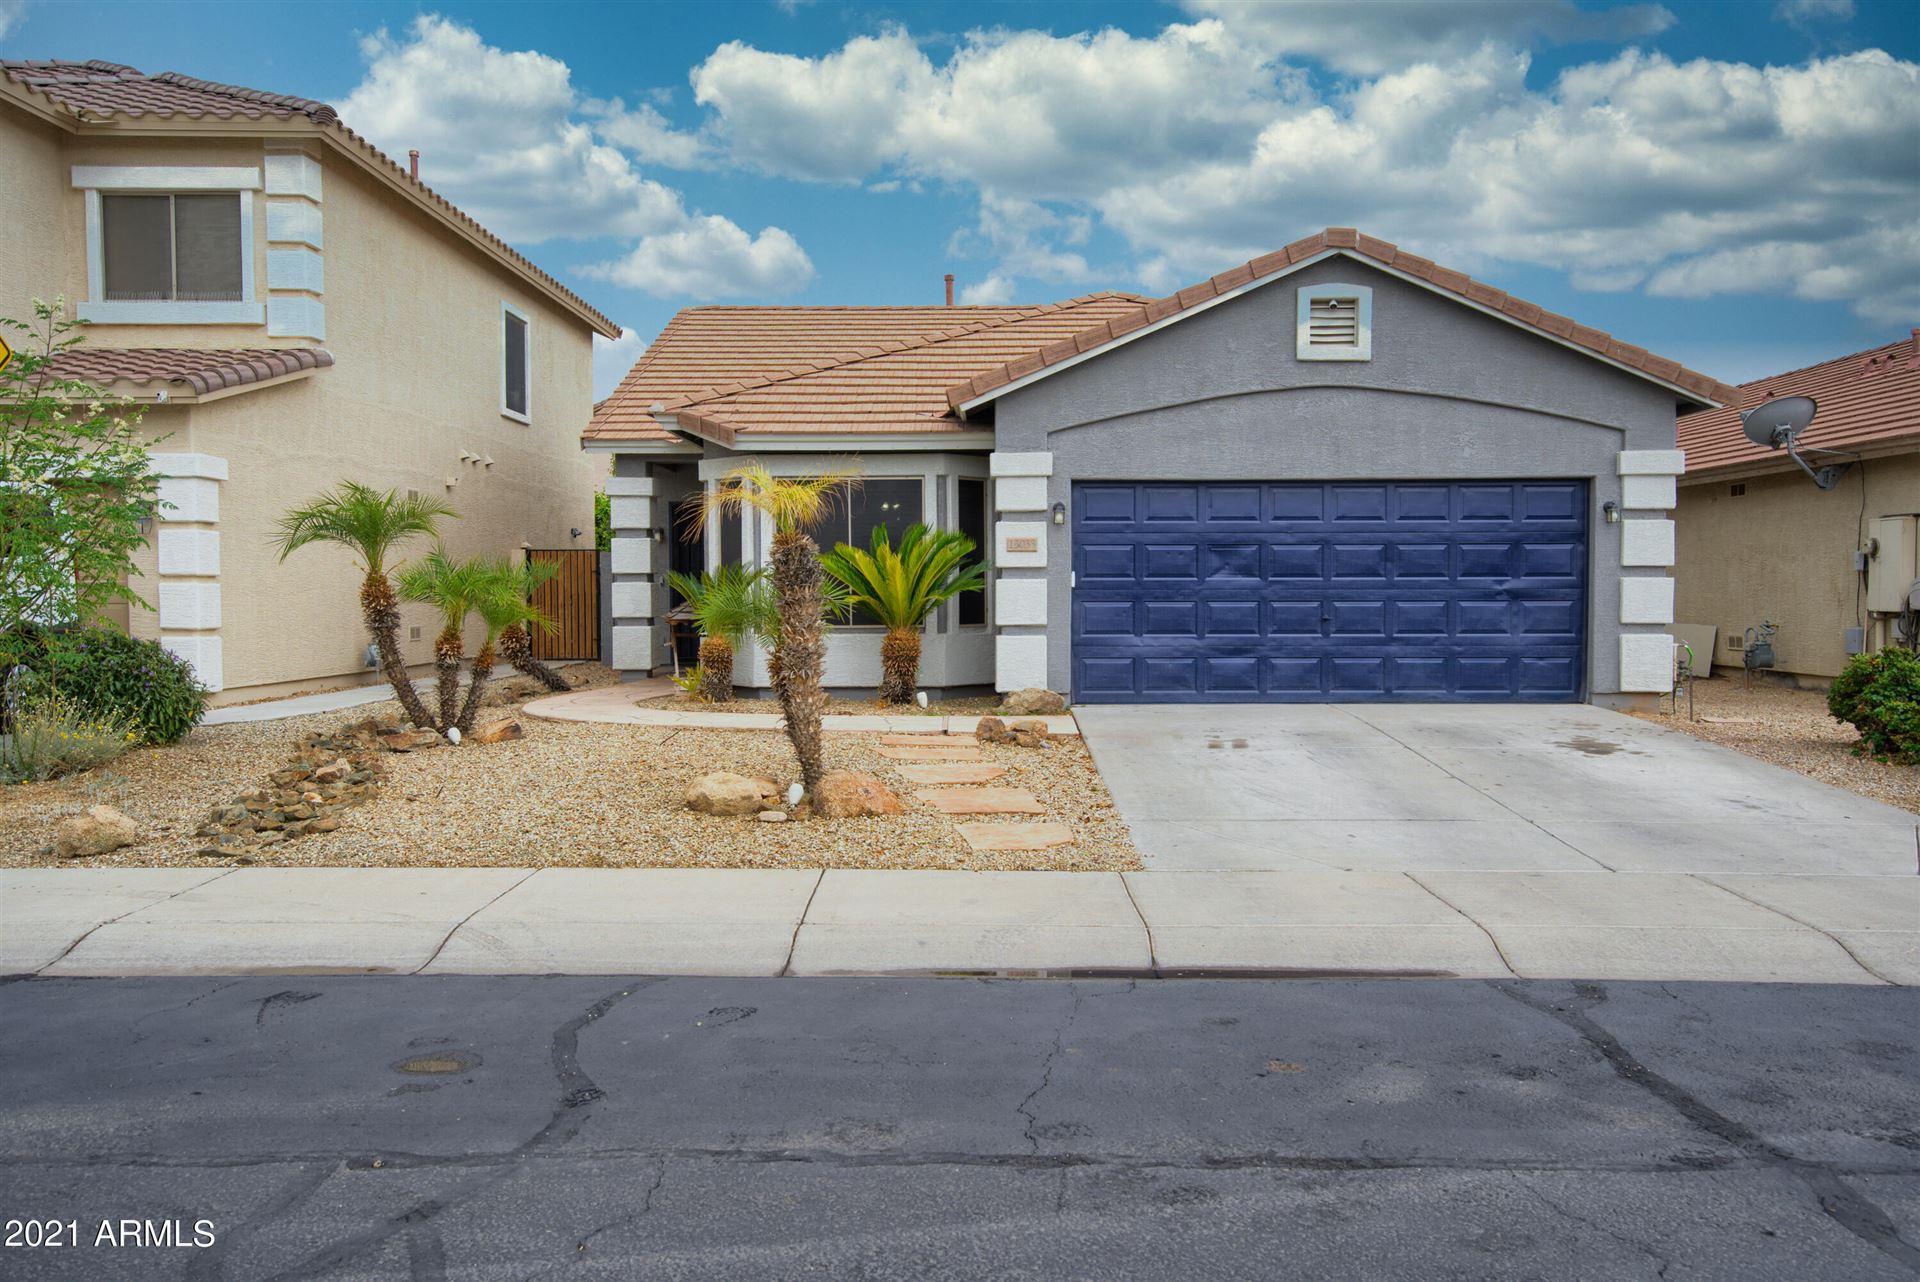 Photo of 13033 W COLUMBINE Drive, El Mirage, AZ 85335 (MLS # 6256936)